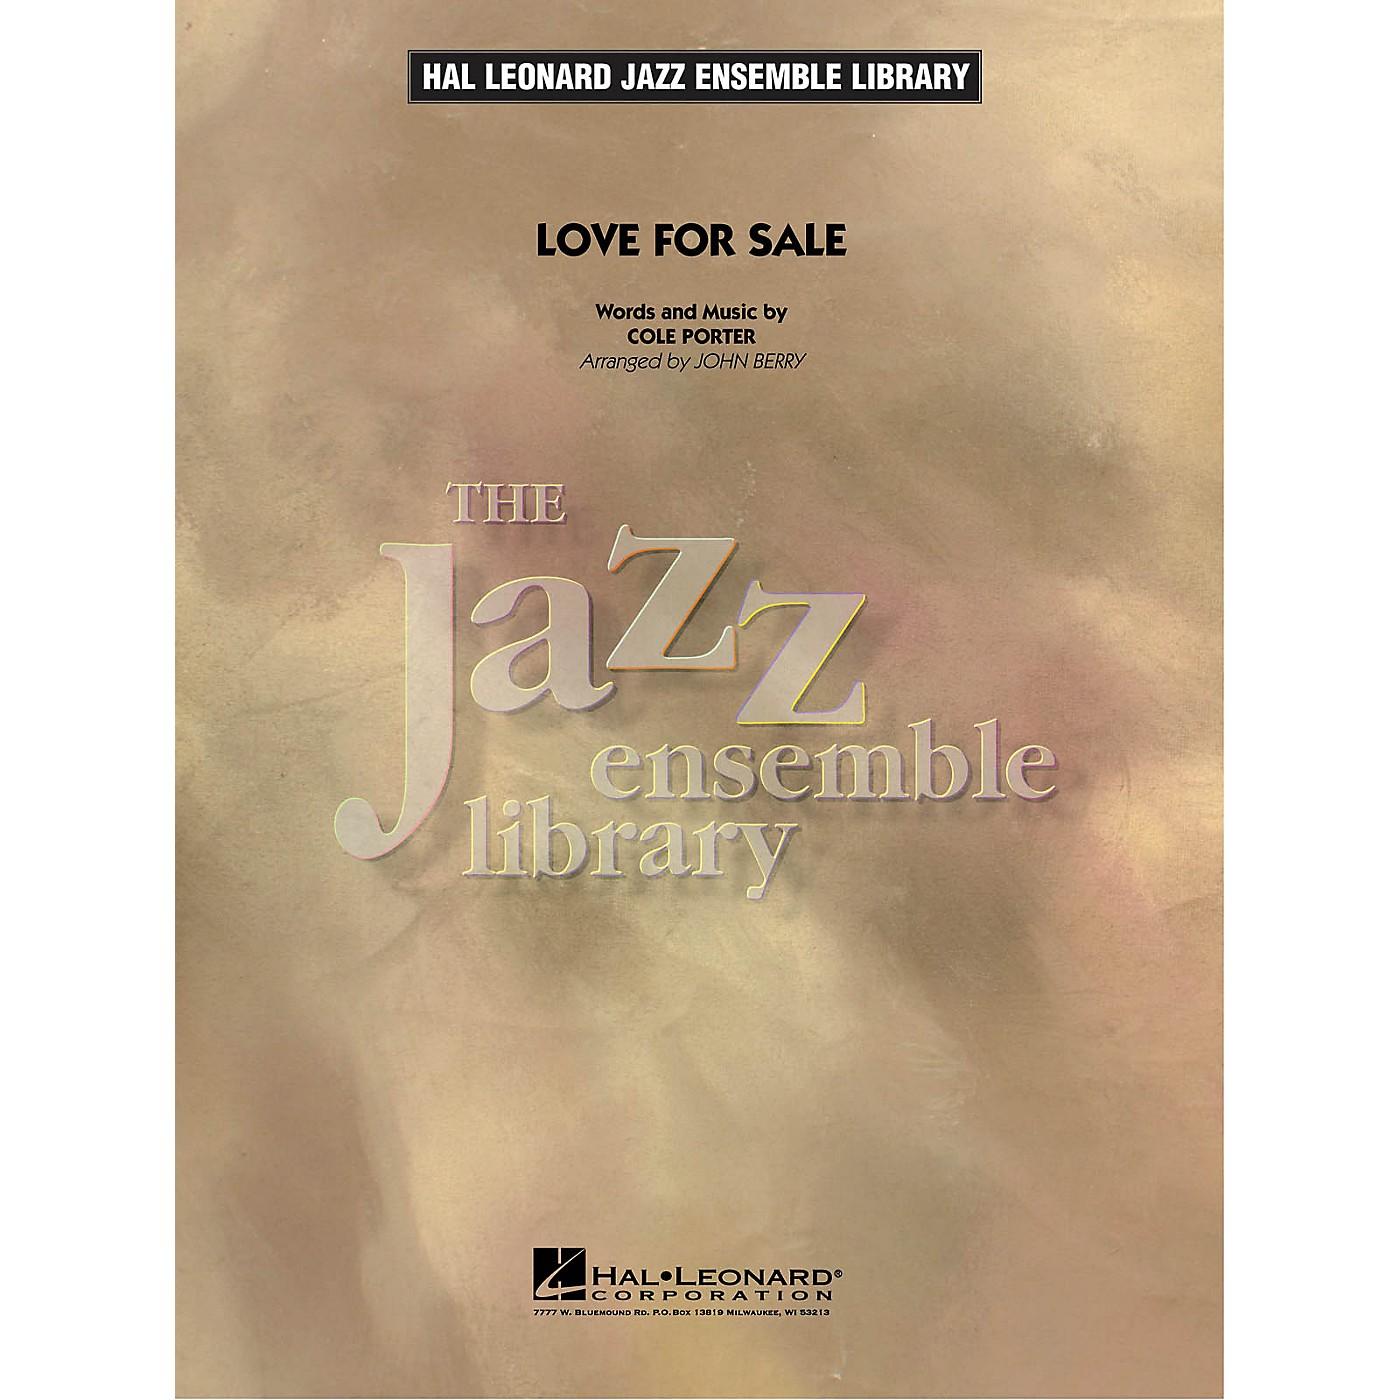 Hal Leonard Love for Sale Jazz Band Level 4 Arranged by John Berry thumbnail